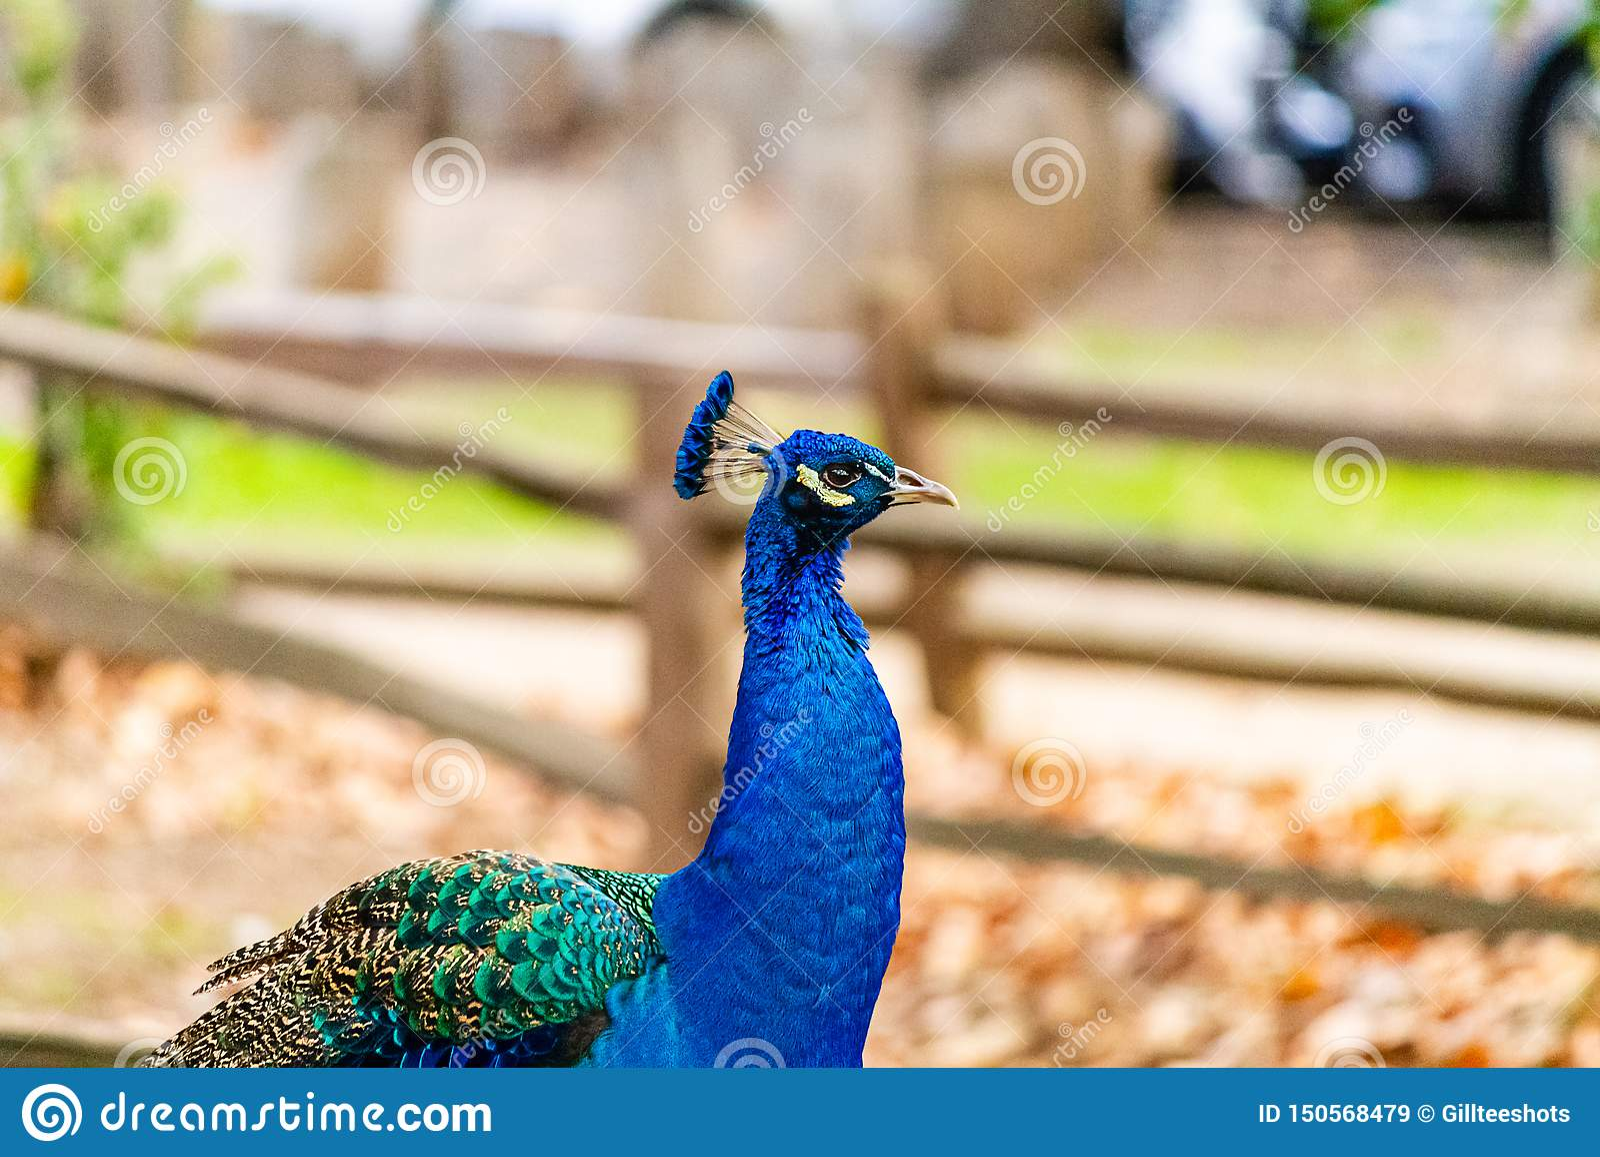 A Proud Peacock Portrait on a farm